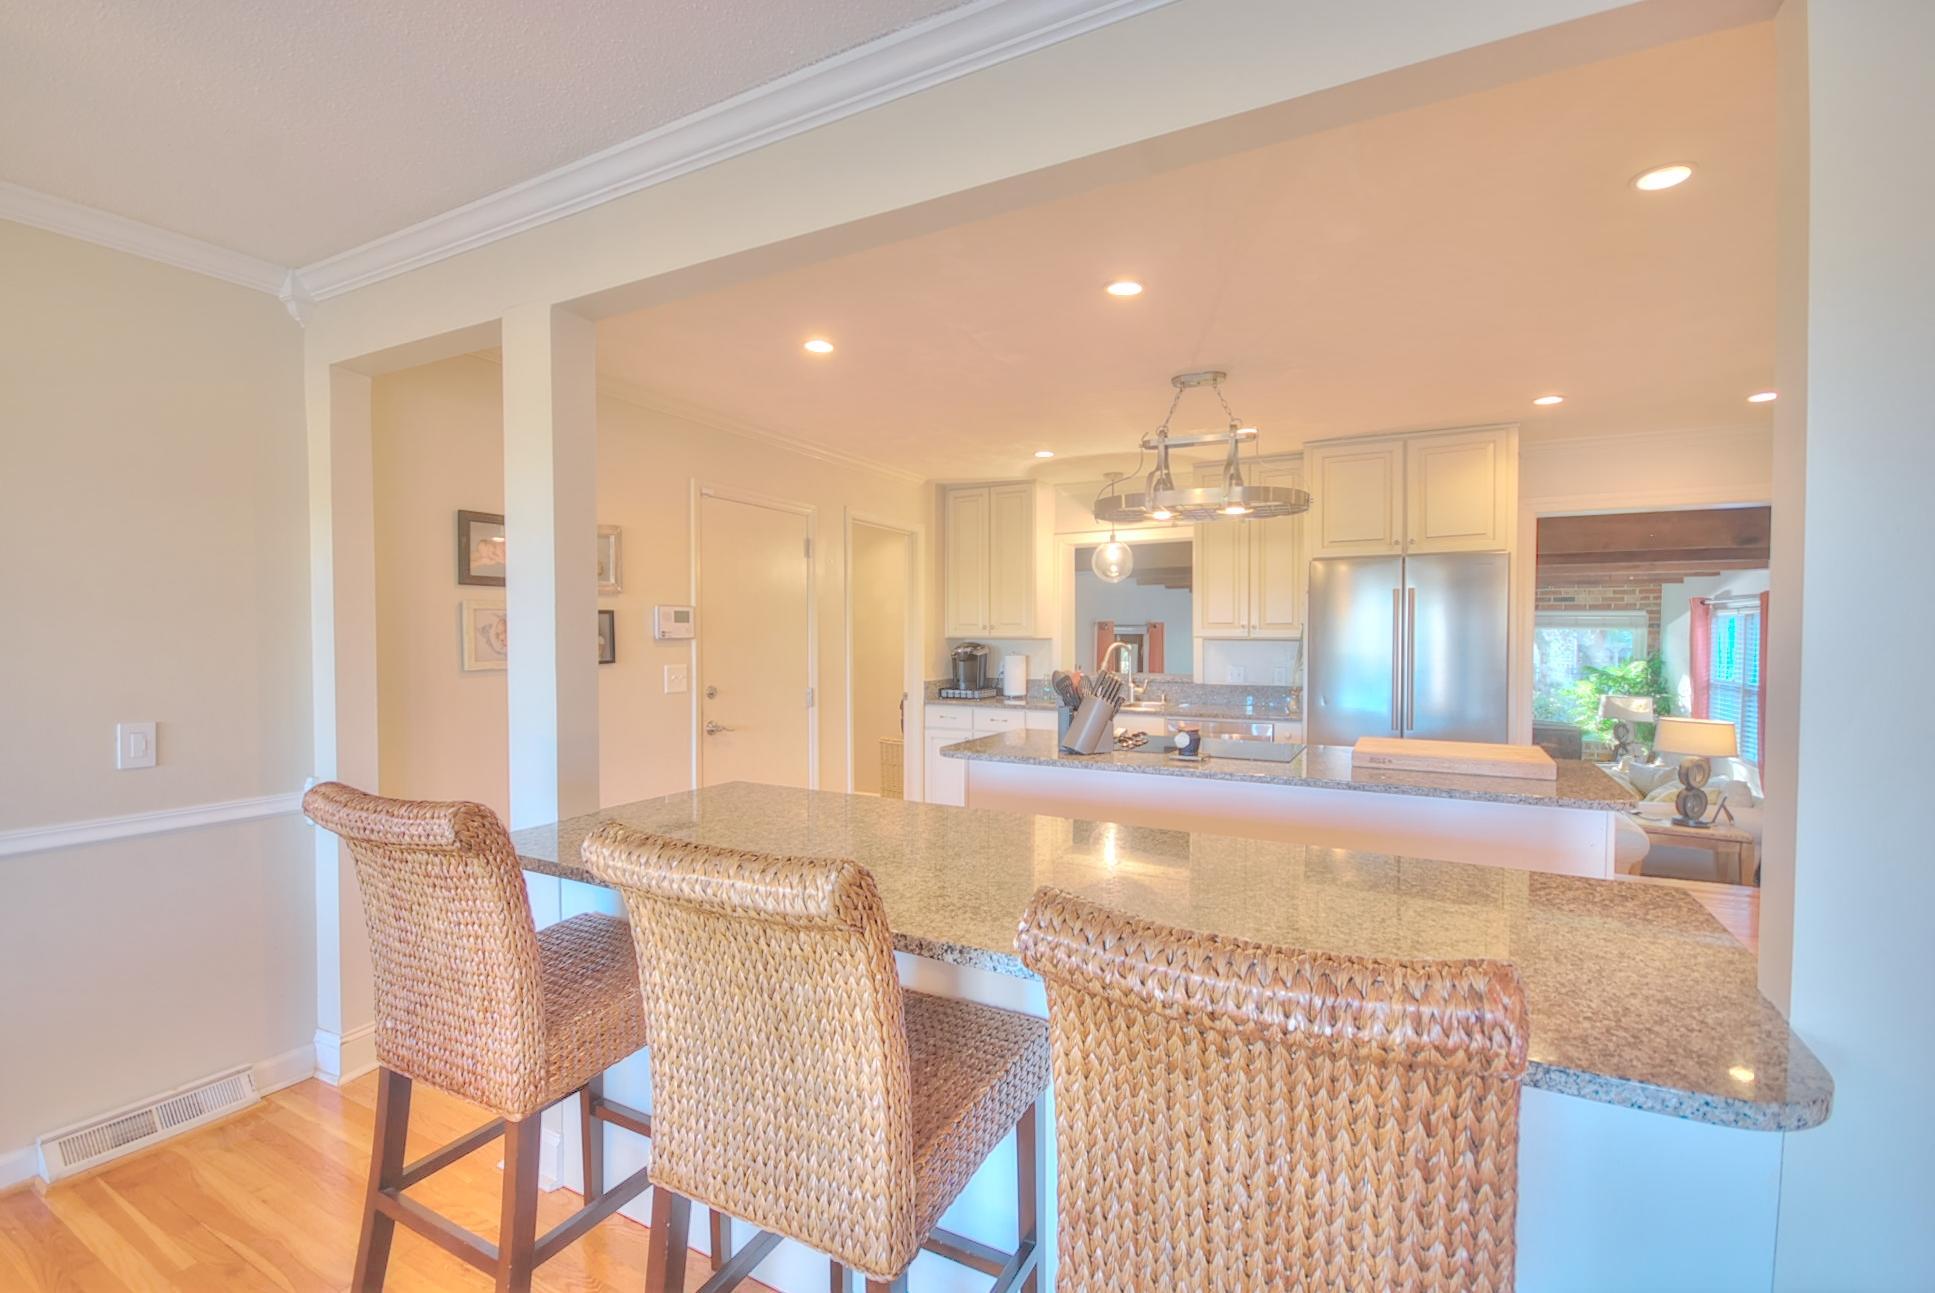 Capri Isles Homes For Sale - 213 Wappoo, Charleston, SC - 1